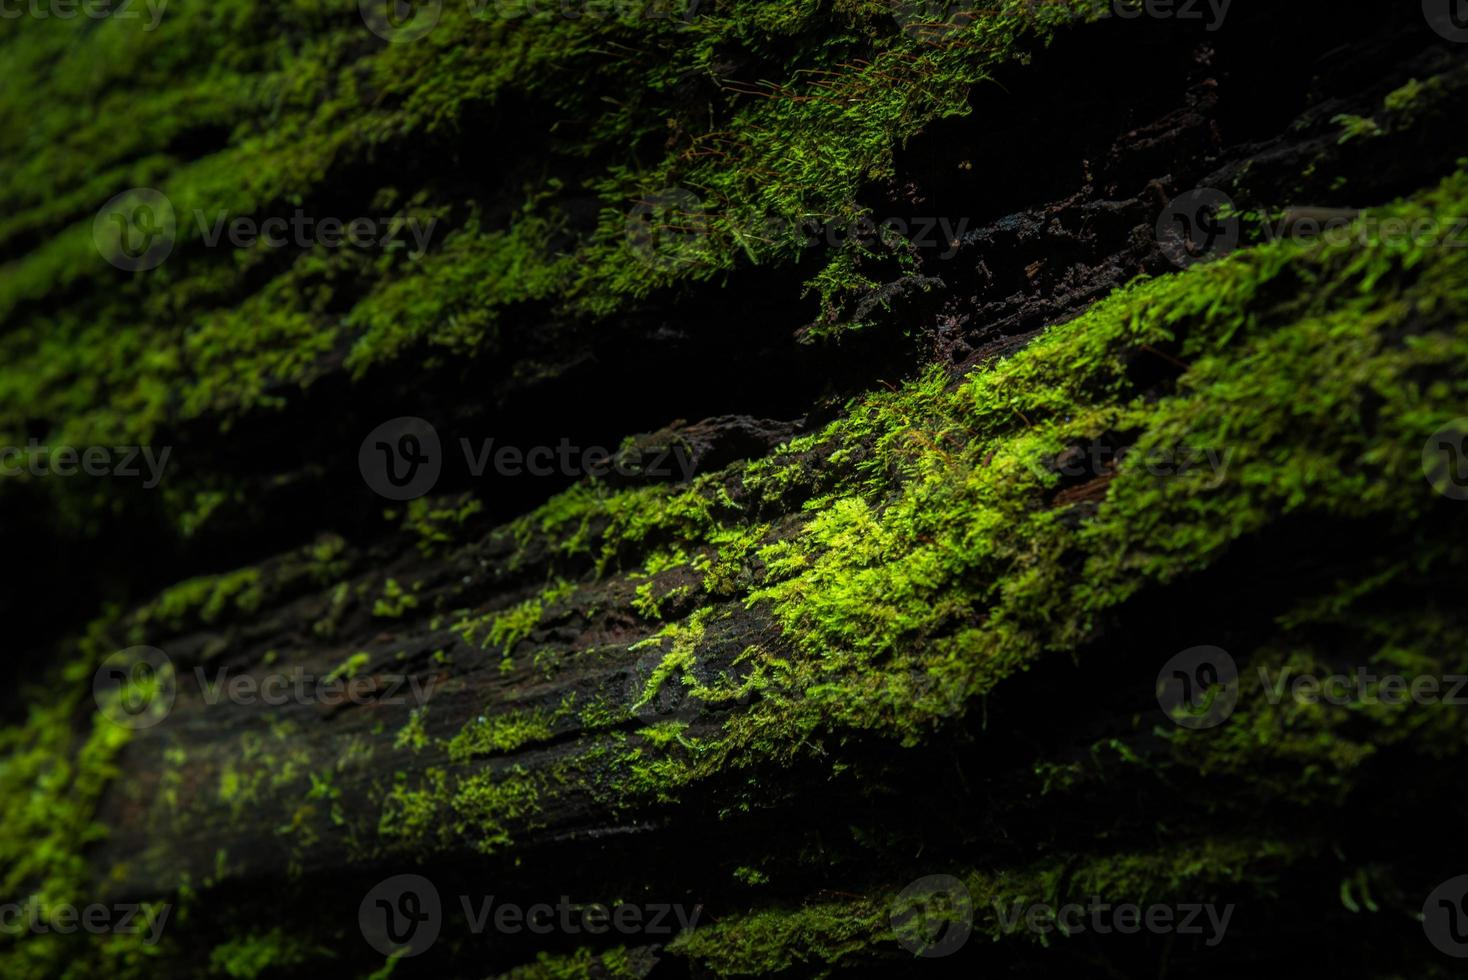 The moss photo